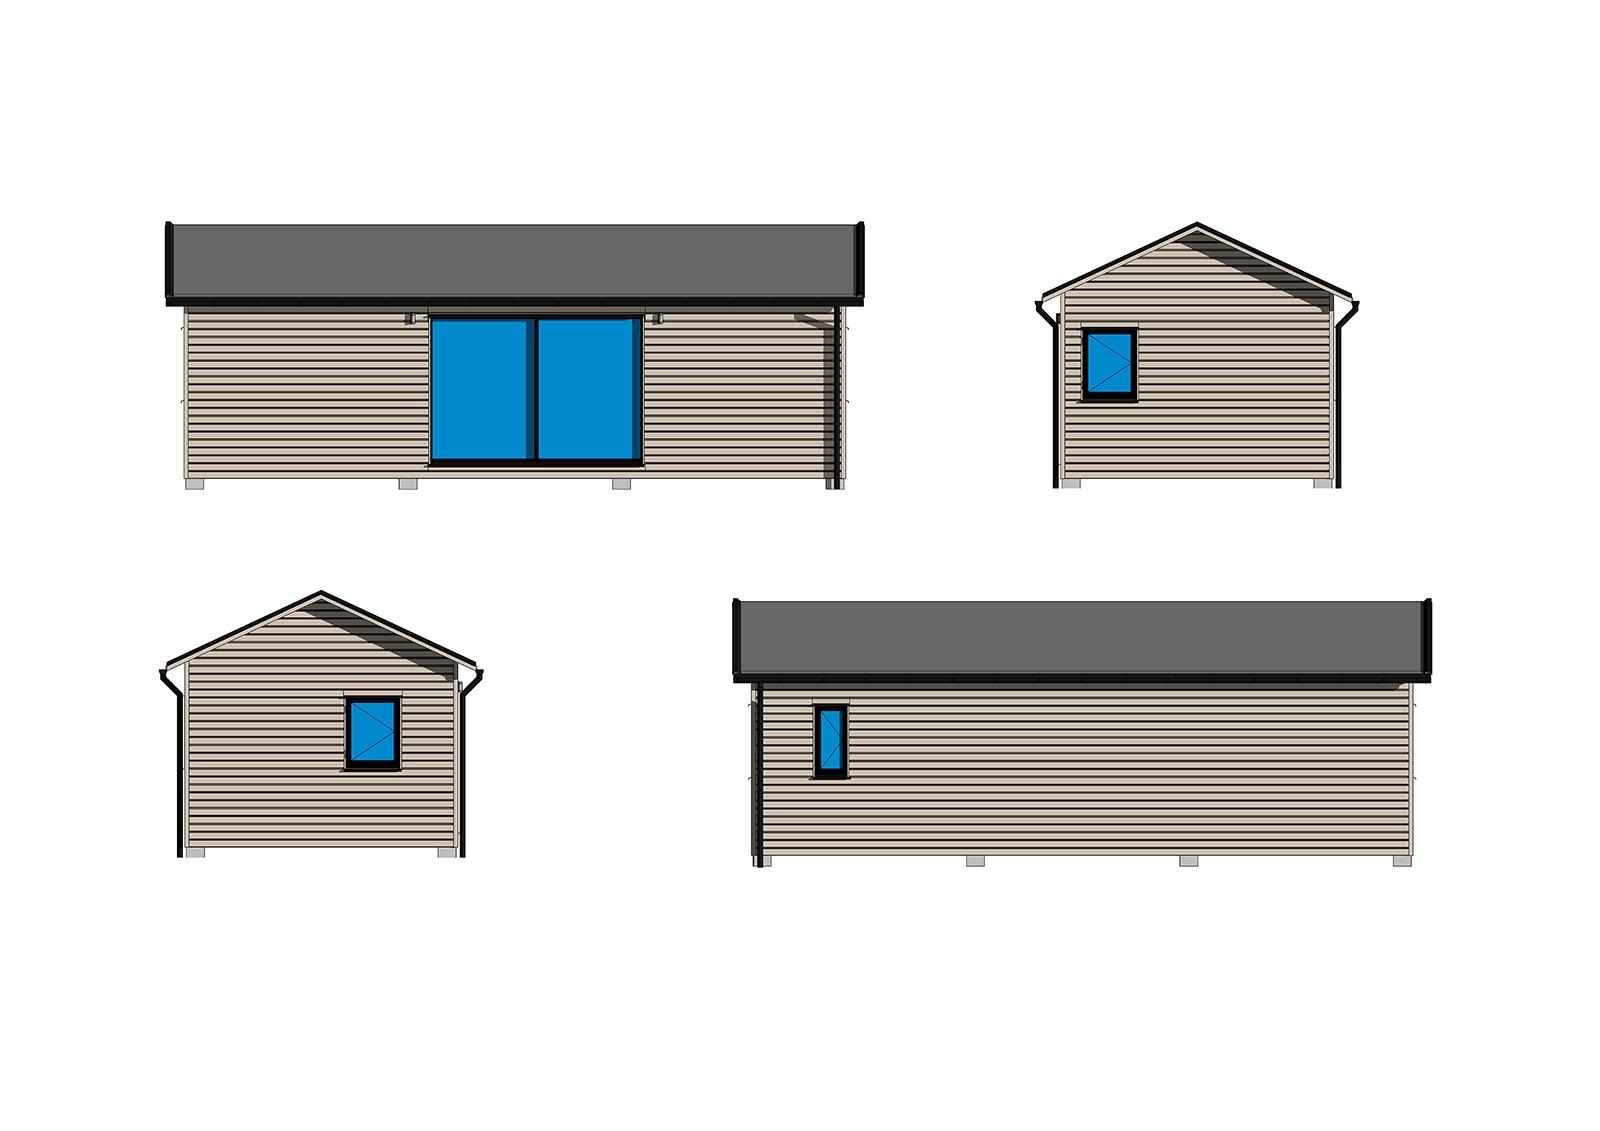 cabin-35-fasader-sadel.jpg